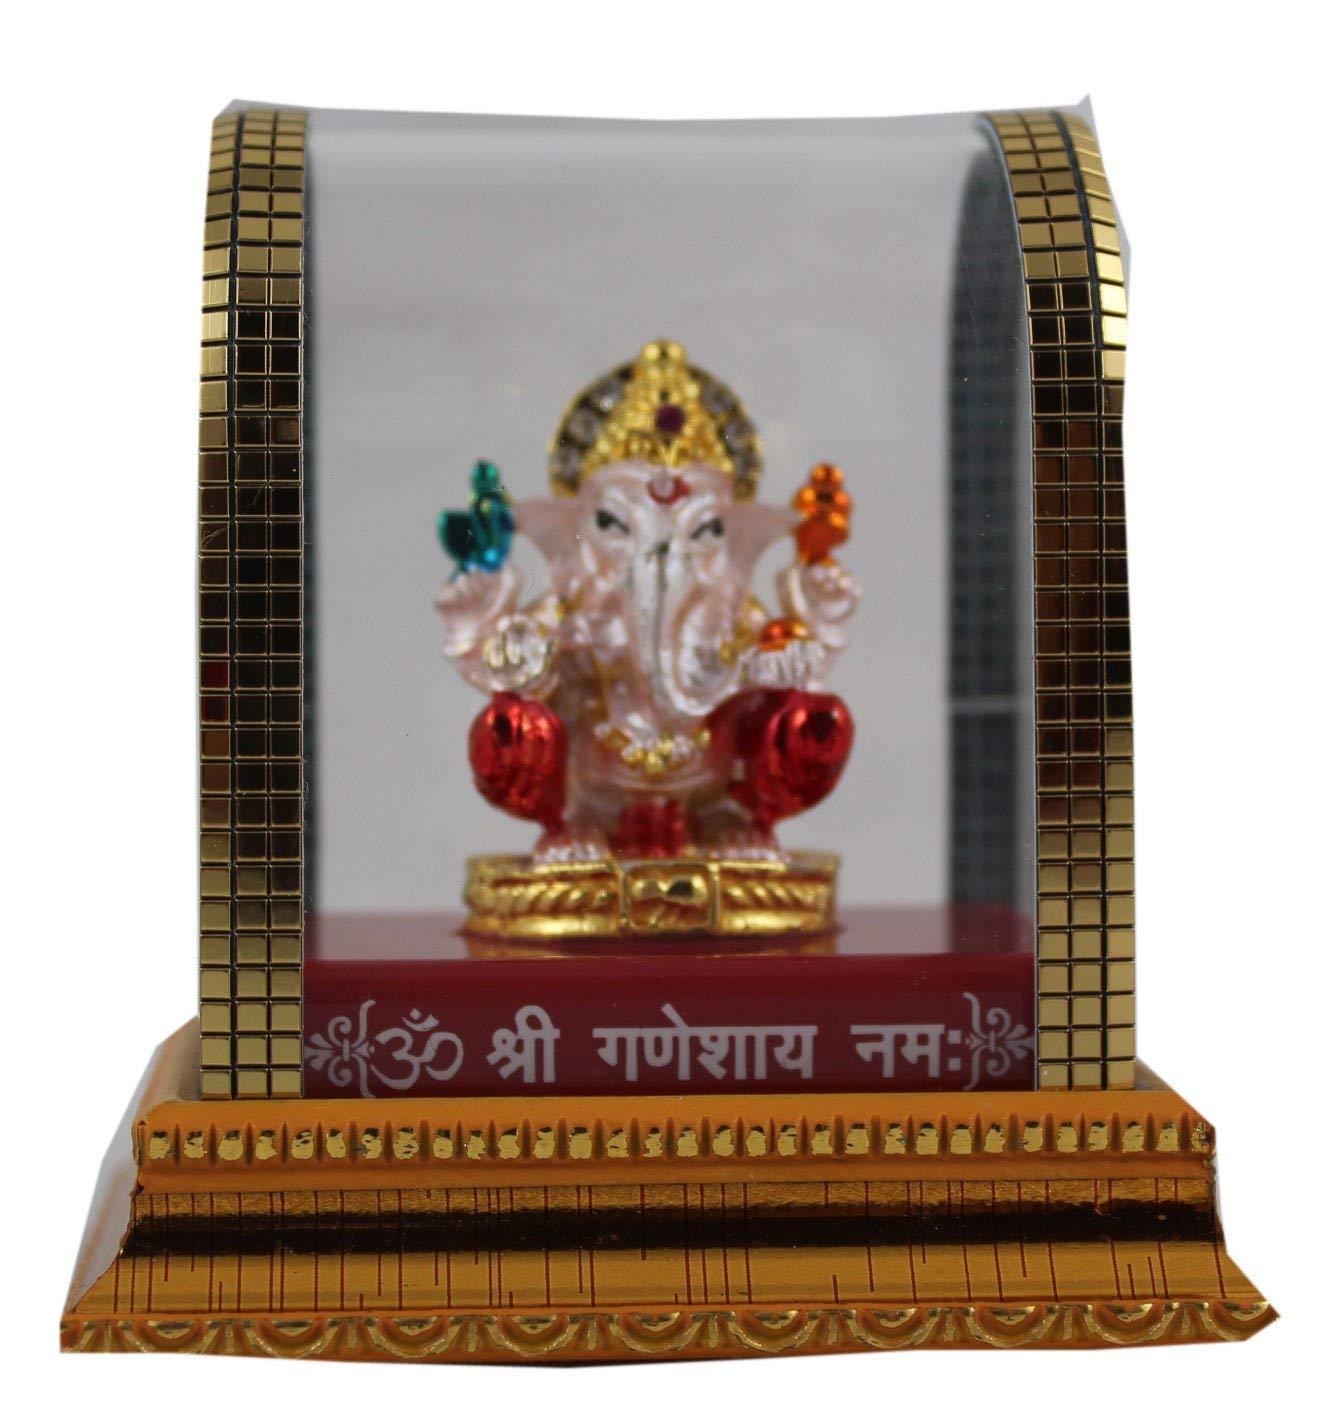 Odishabazaar Idol for car Dashboard Pooja puja Statues for Decoration multi14